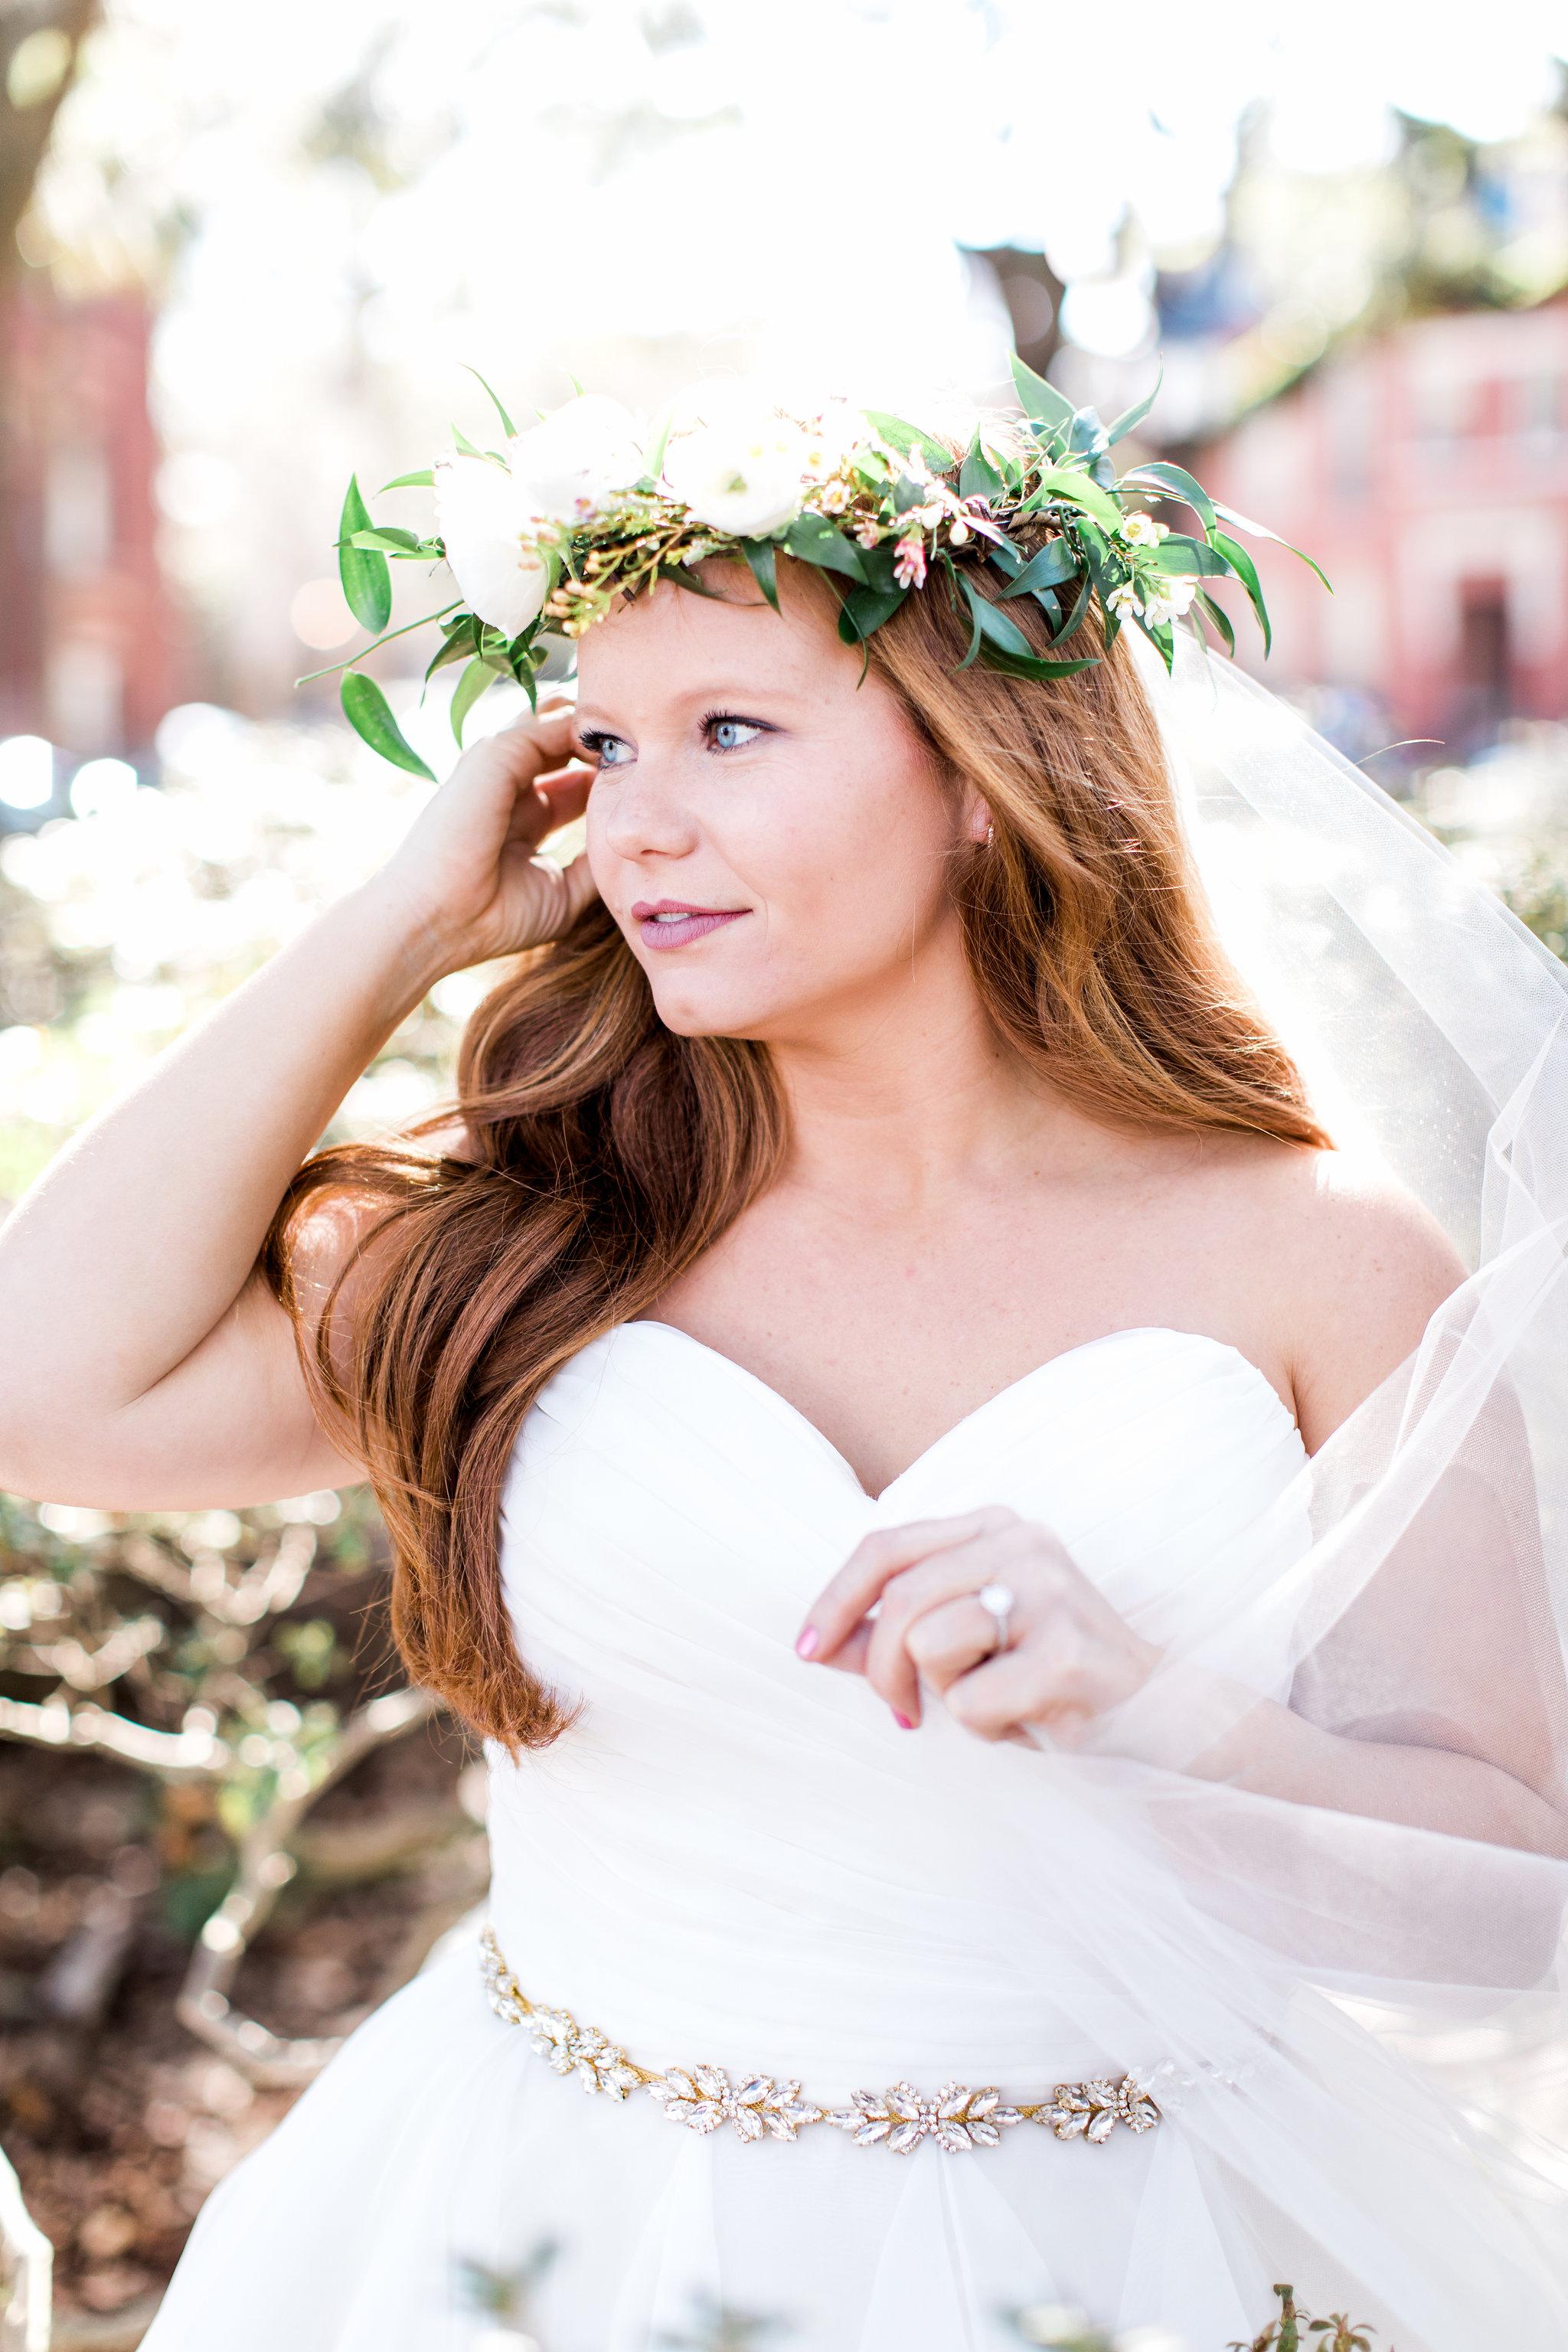 apt-b-photography-mary-elizabeths-bridal-boutique-adele-amelia-accessories-morilee-5504-savannah-bridal-boutique-savannah-weddings-savannah-wedding-photographer-savannah-bridal-gowns-savannah-wedding-dresses-historic-savannah-wedding-10.jpg